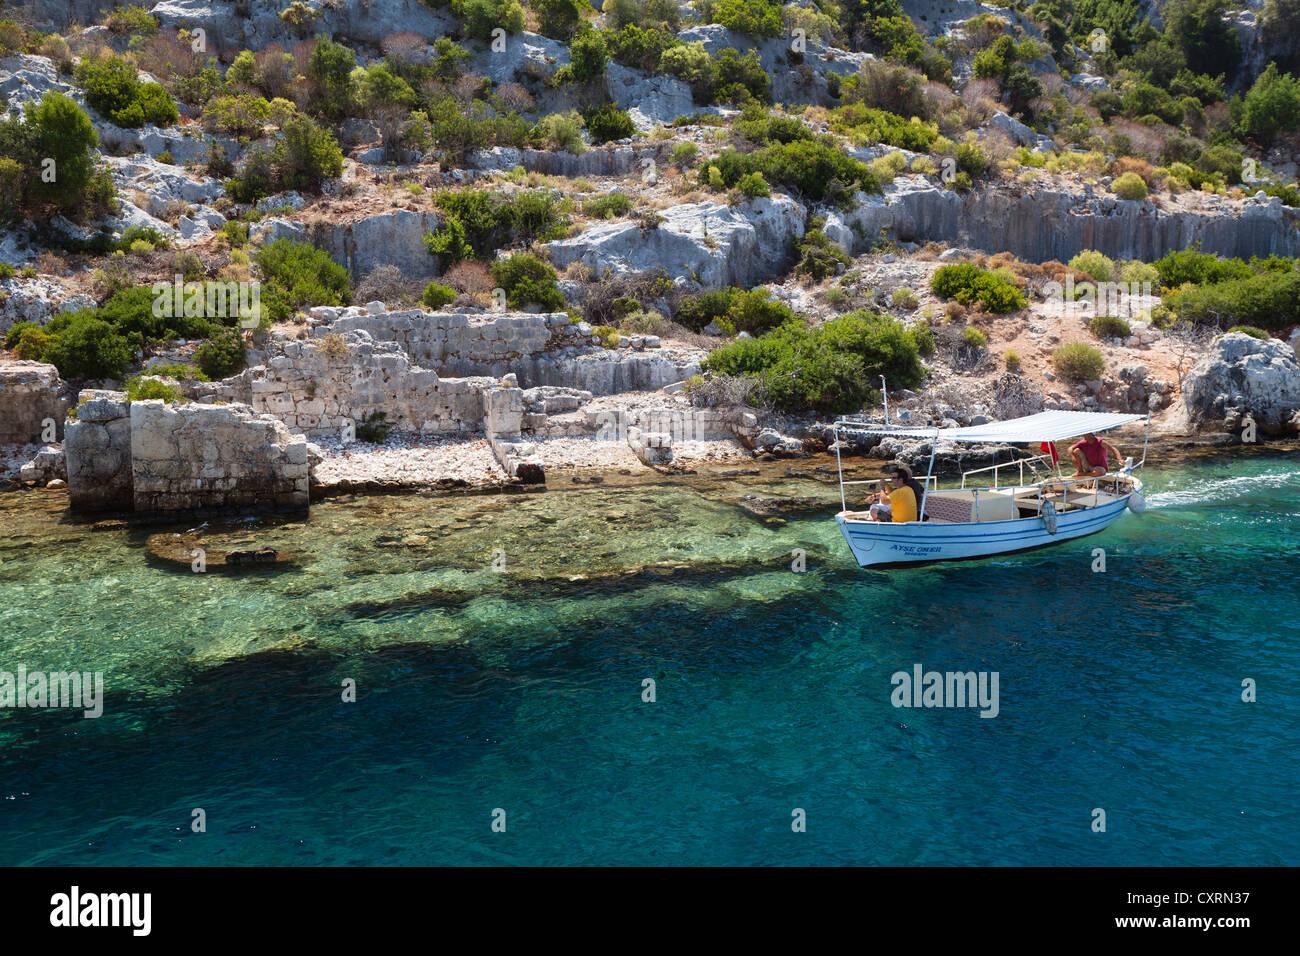 Ancient city of Simena, sunken cty of Kekova, Lycian coast, Lycia, Mediterranean Sea, Turkey, Asia Minor - Stock Image